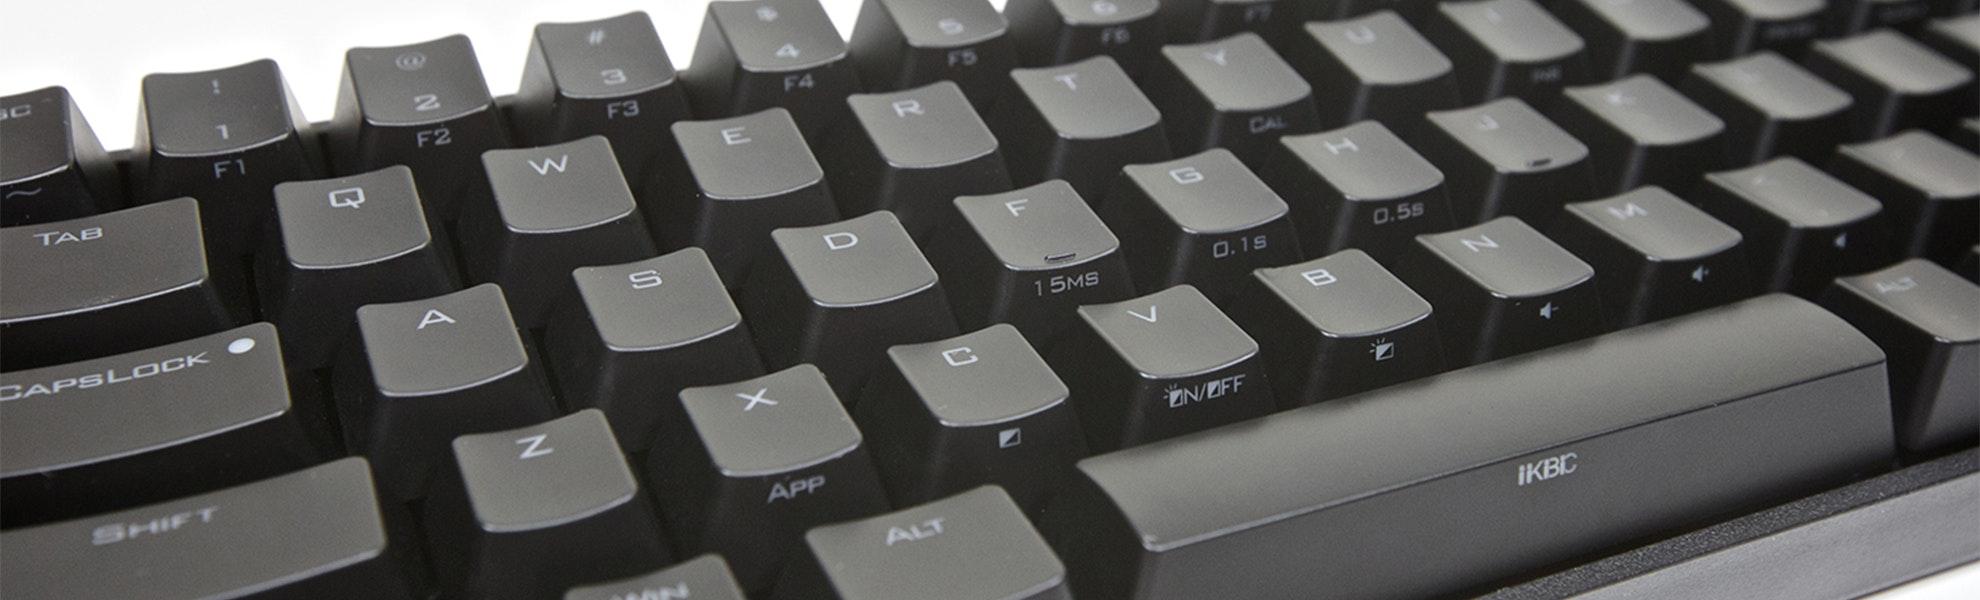 KBT Pure Pro Mechanical Keyboard